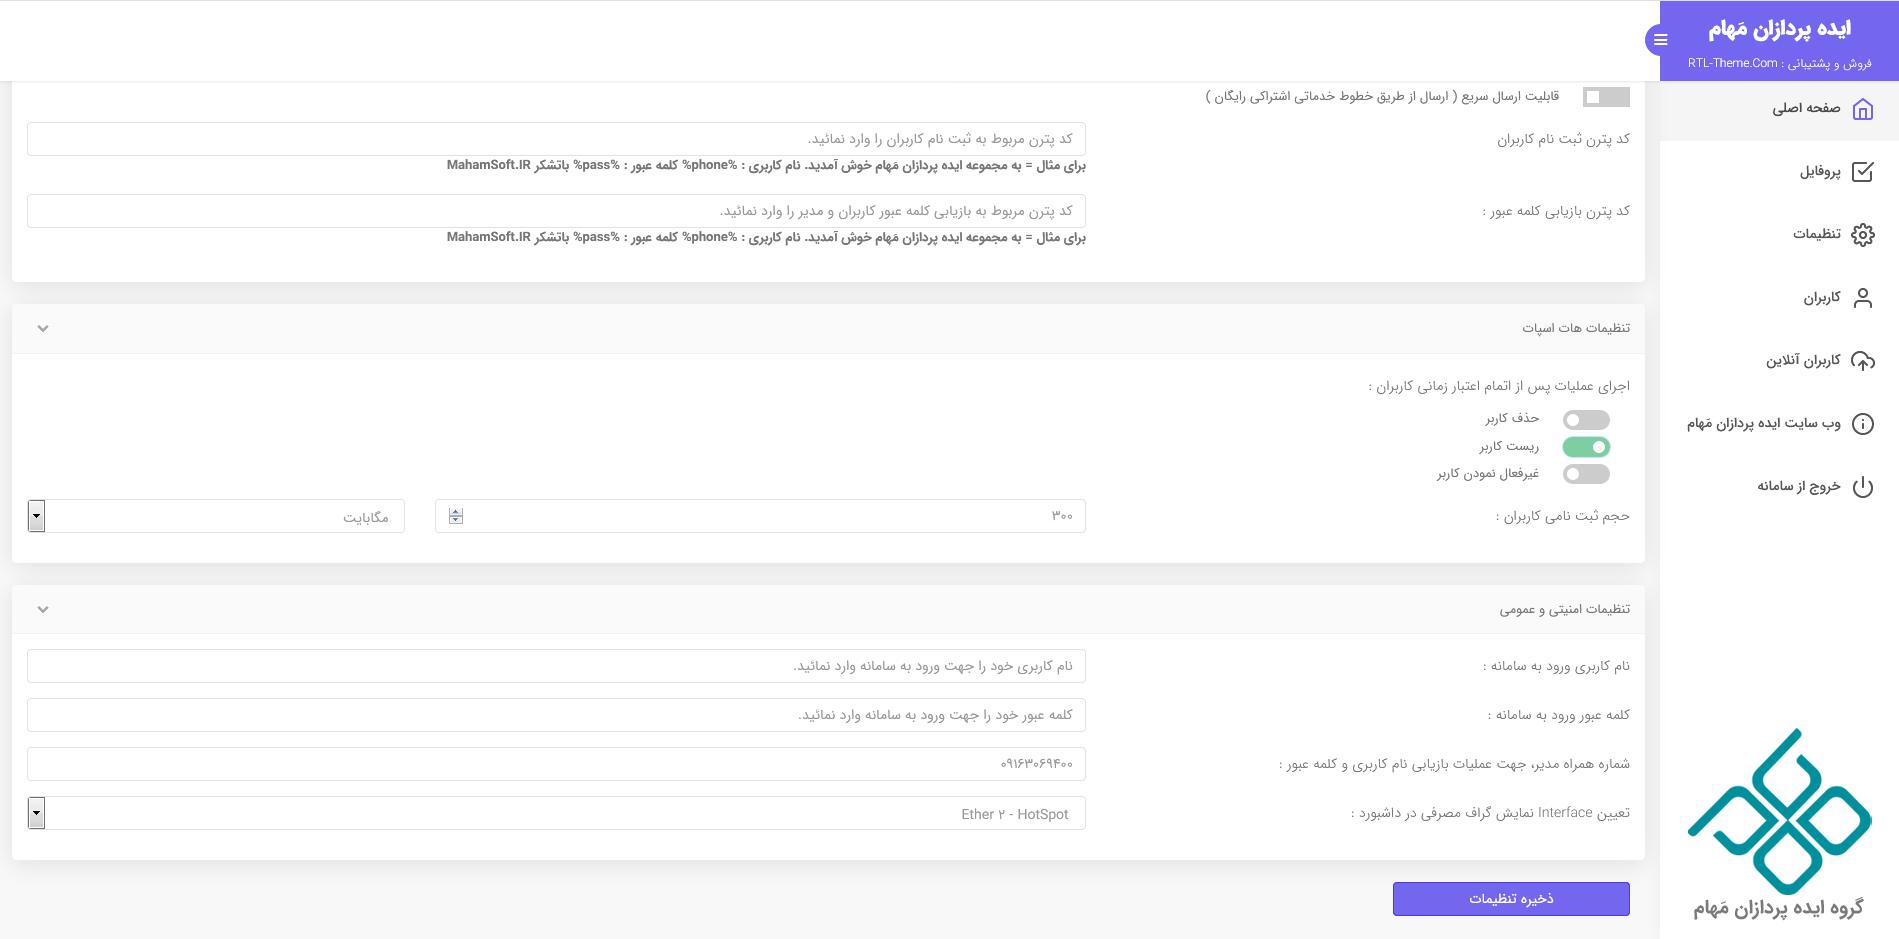 7226 6e964f124d1501a1c06c952dc - اسکریپت Maham | اسکریپت هات اسپات مدیریت شبکه WIFI مهام